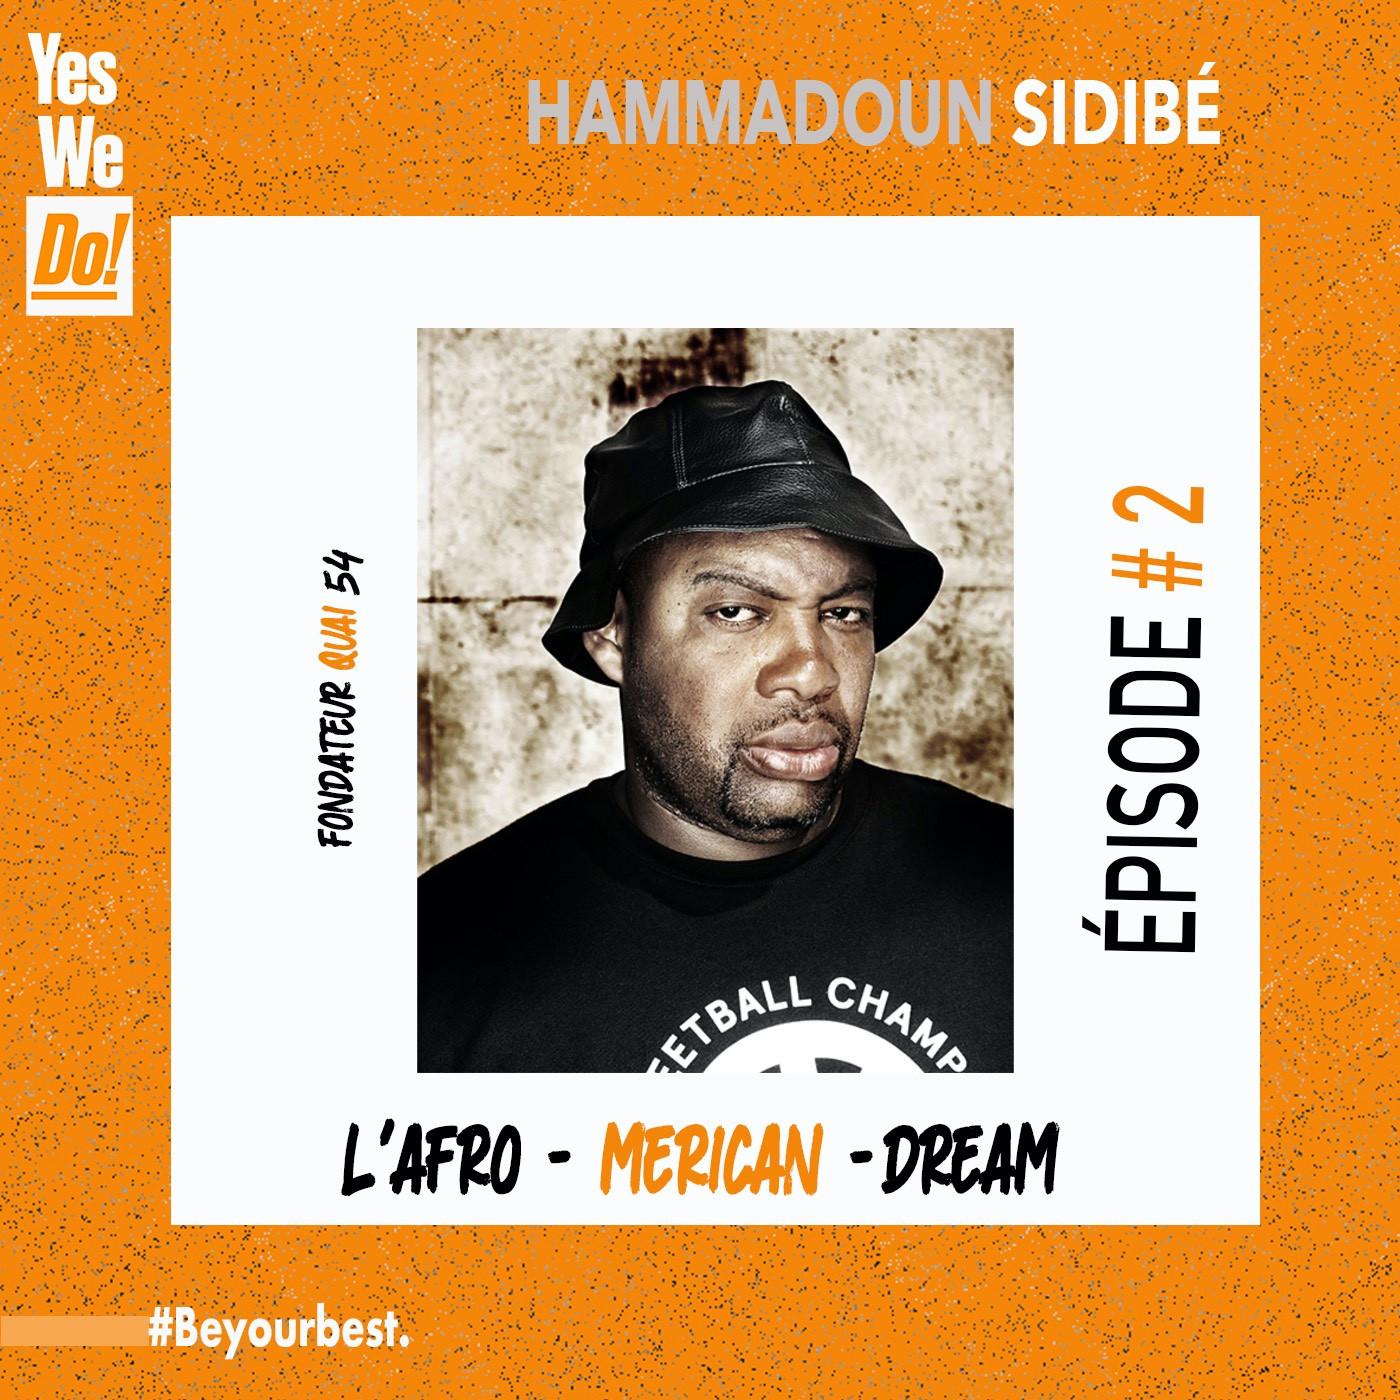 Afro - Merican - Dream